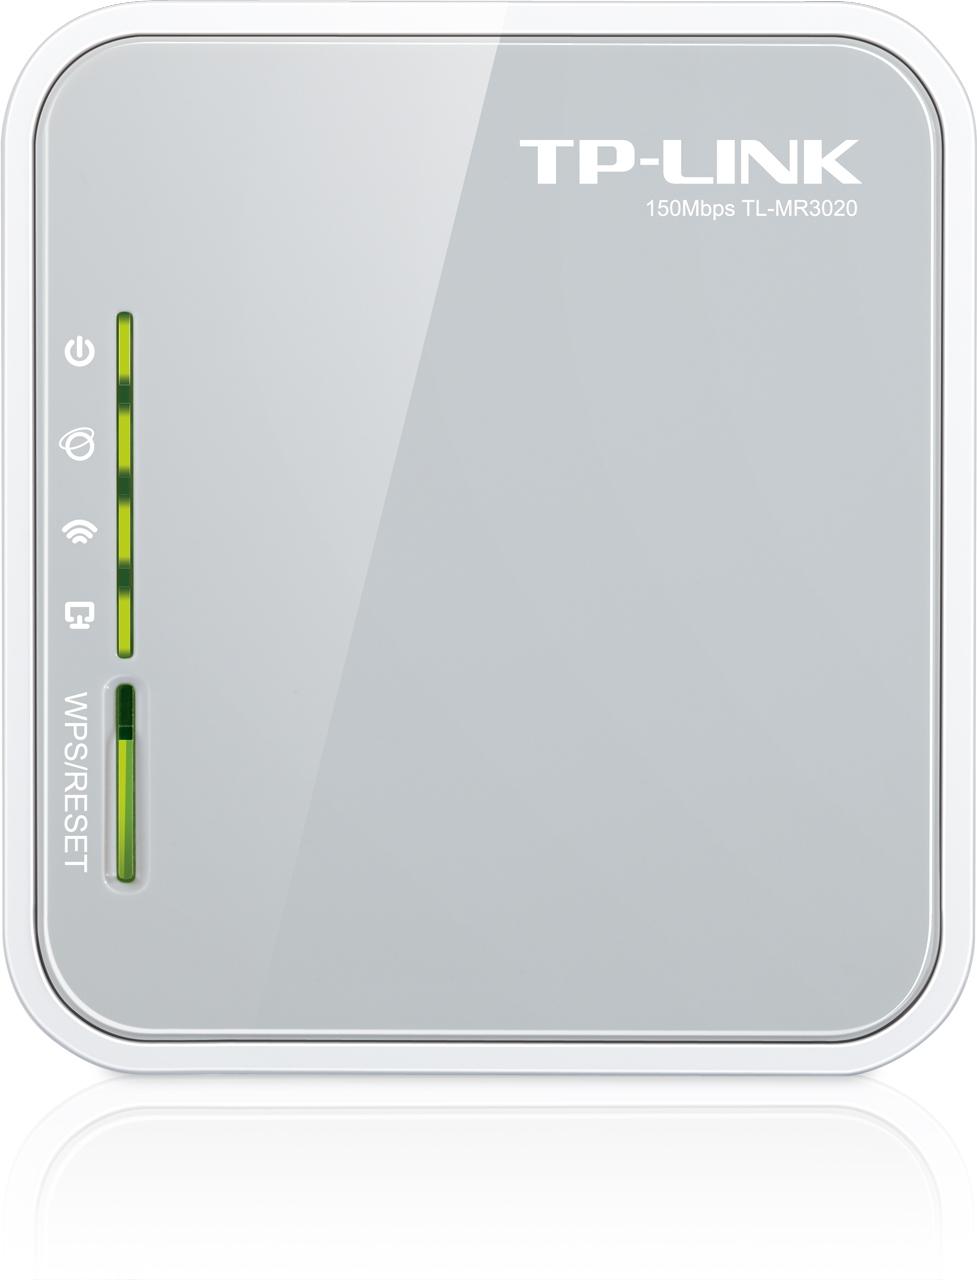 24ghz 300mbps 9dbi Outdoor Cpe Tp Link Maroc Dml Tplink Pharos Cpe210 Routeur Sans Fil N 3g 4g Portable